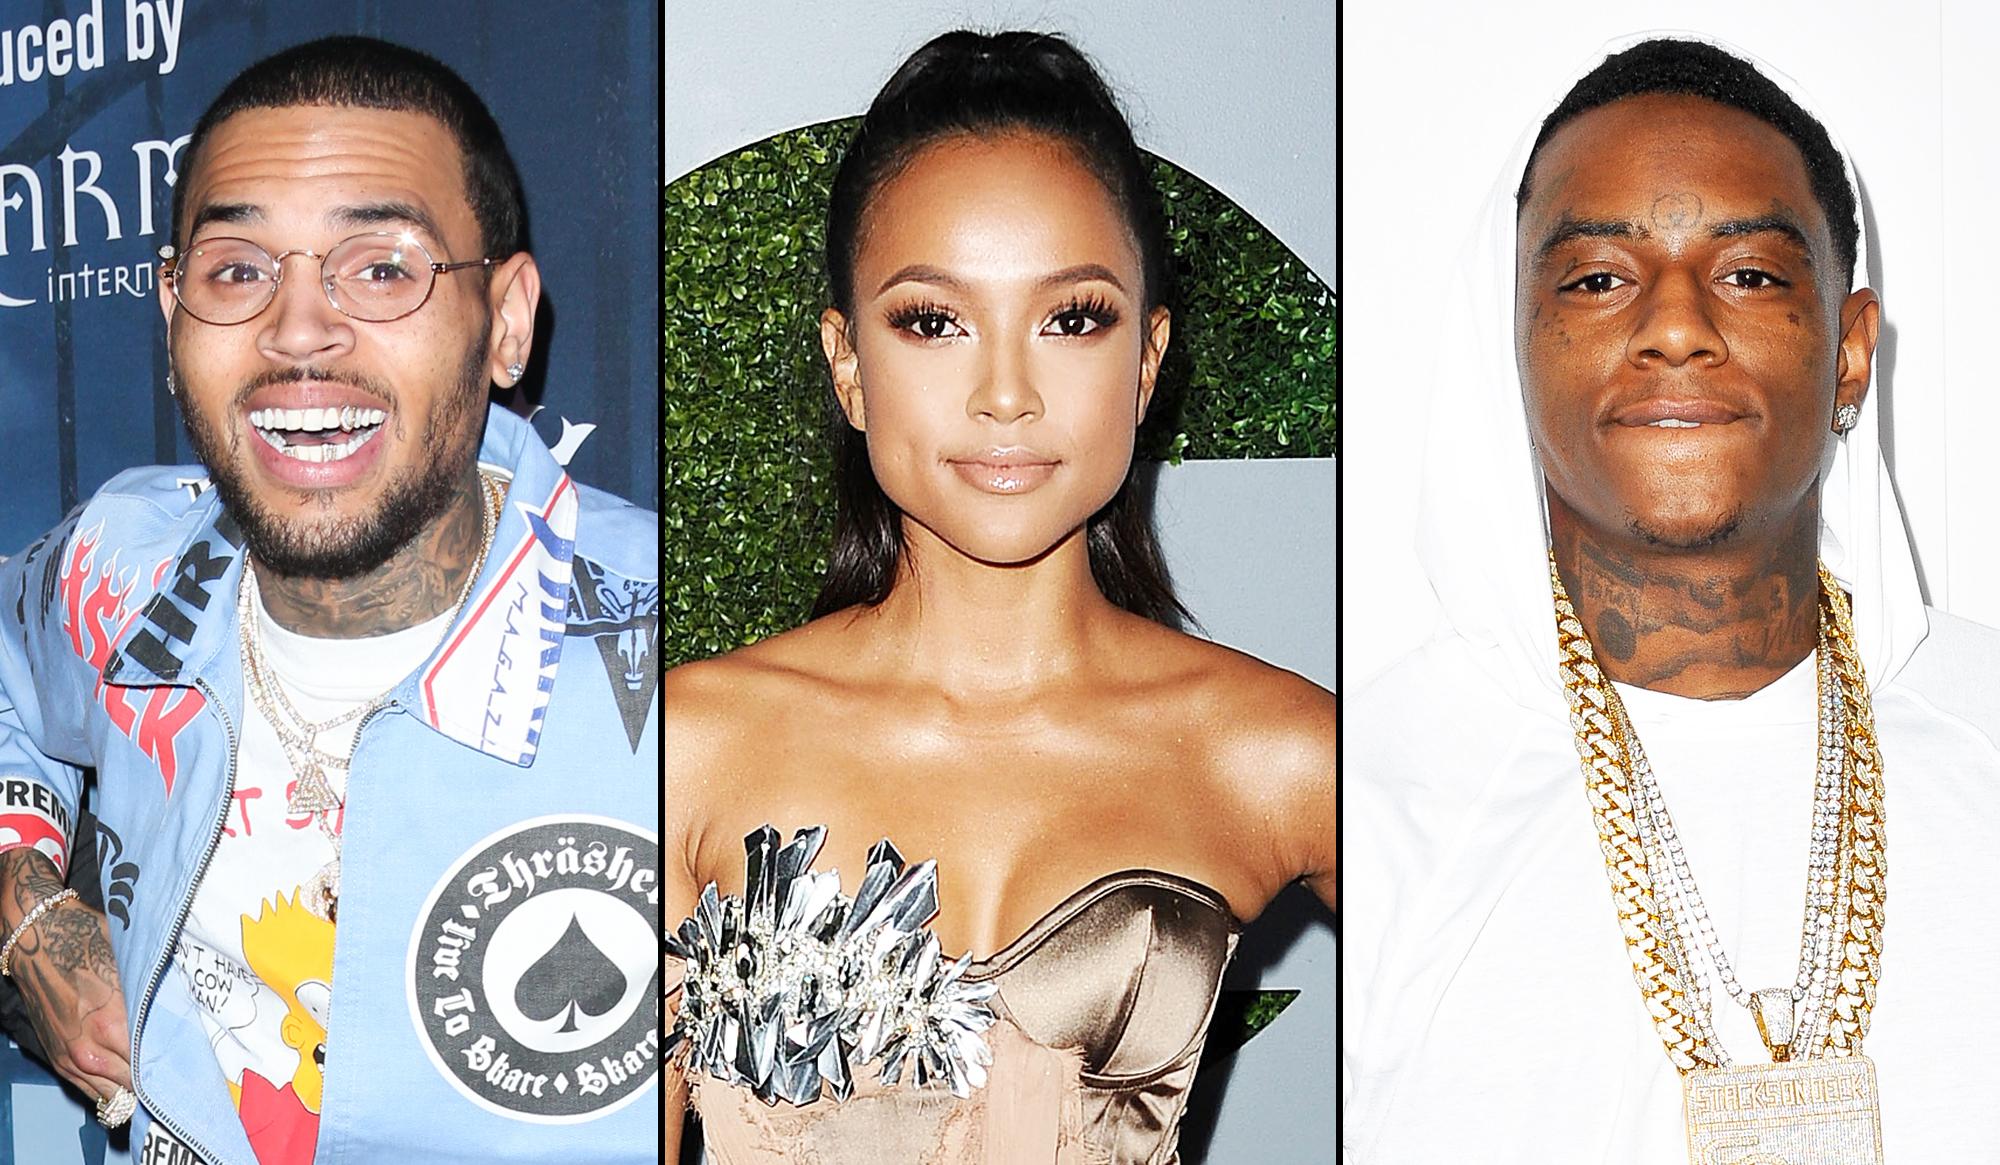 Chris Brown, Karrueche Tran and Soulja Boy